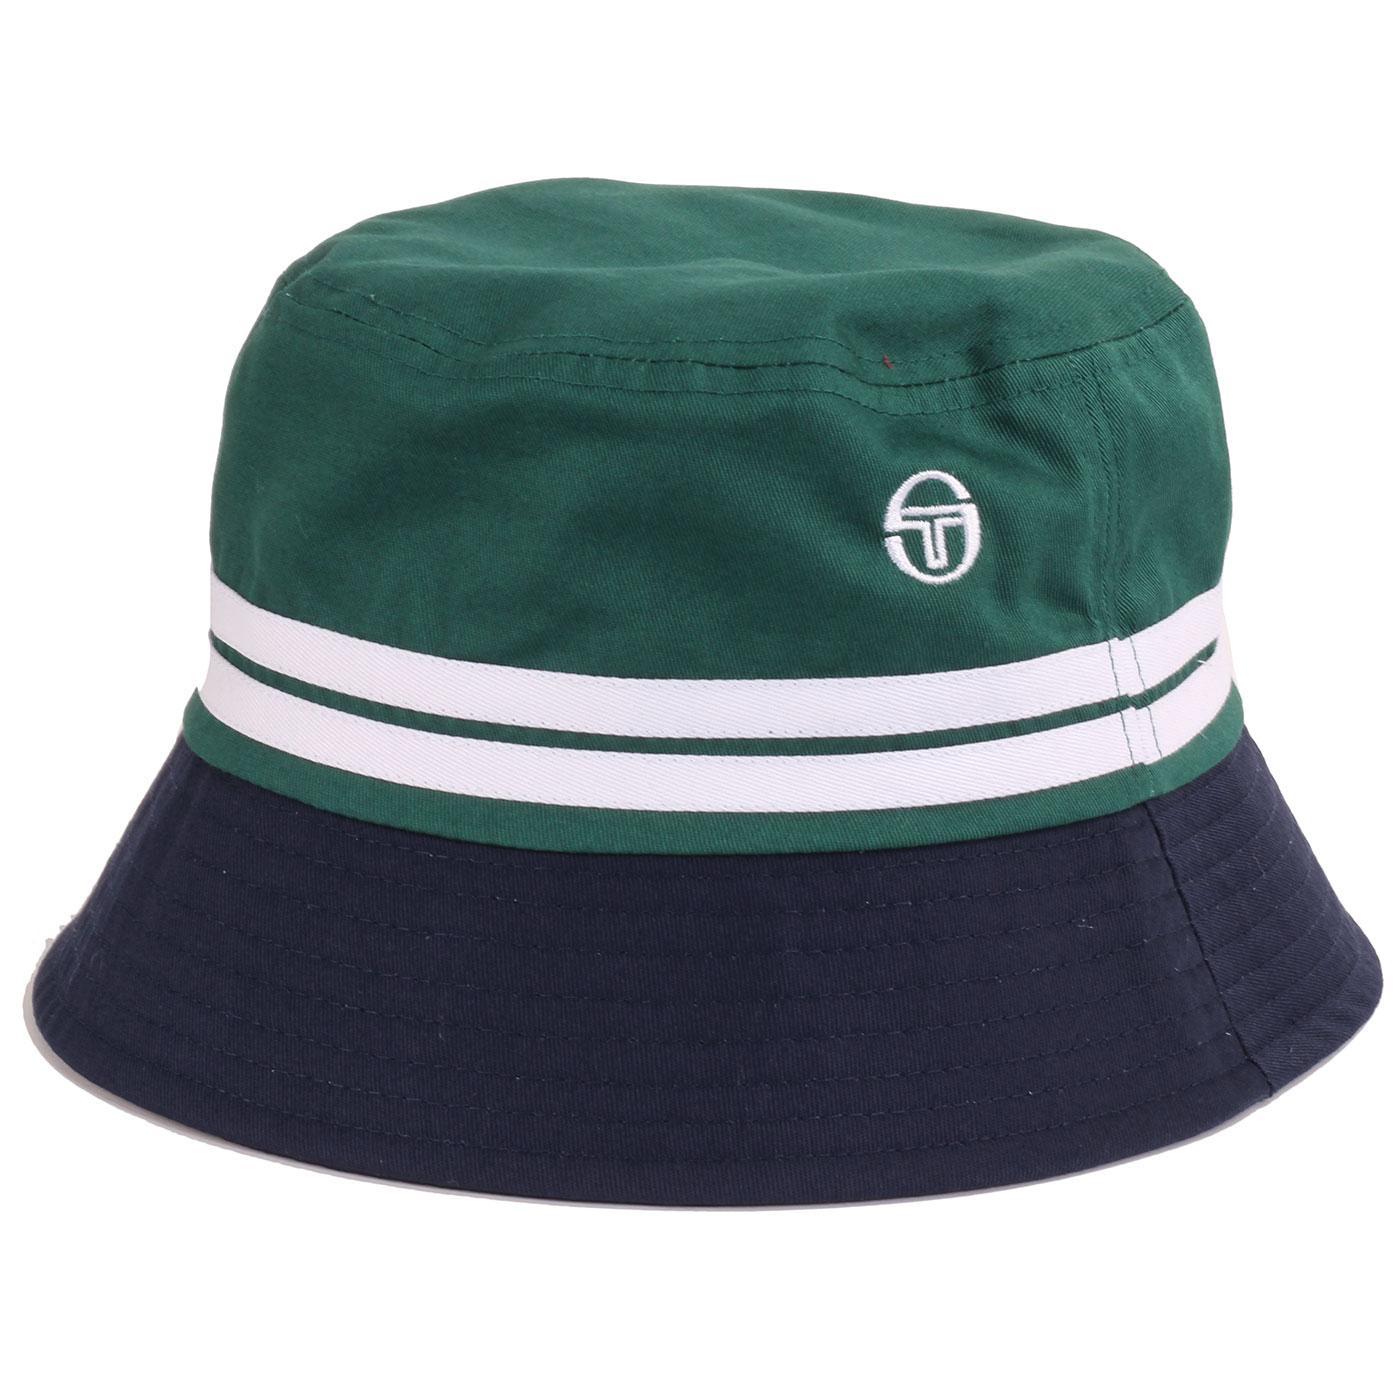 Stonewoods SERGIO TACCHINI Retro Bucket Hat (B/N)